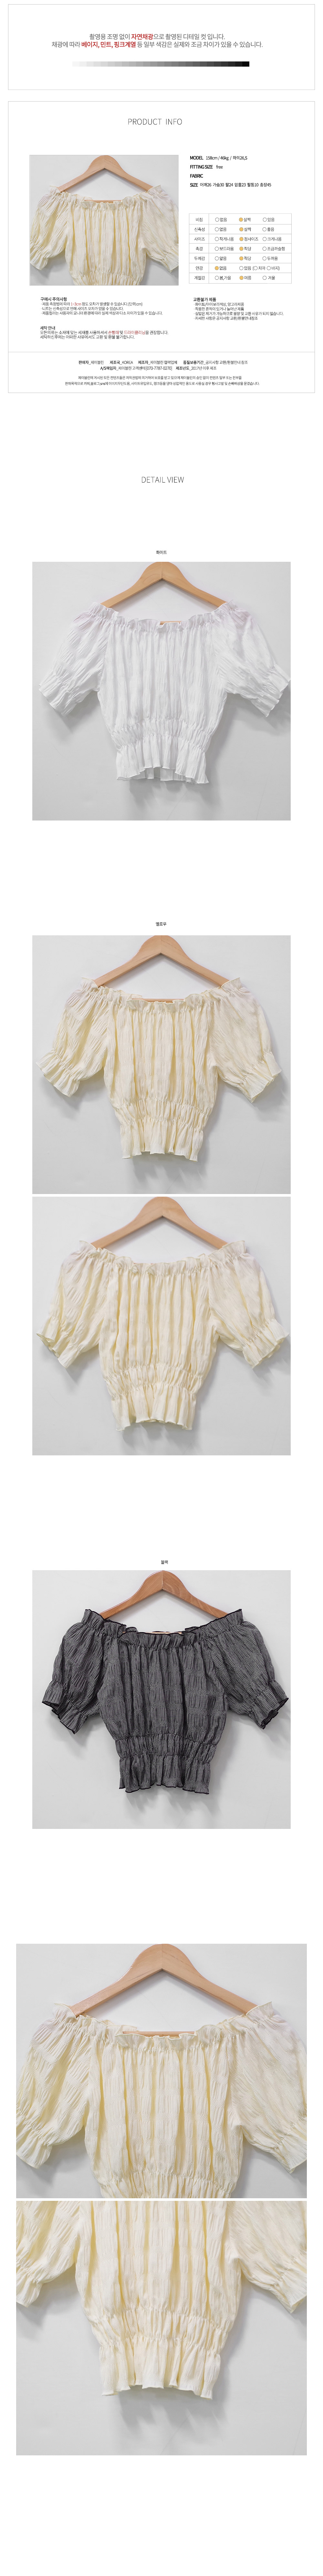 Muti off-the-shoulder ruffle blouse